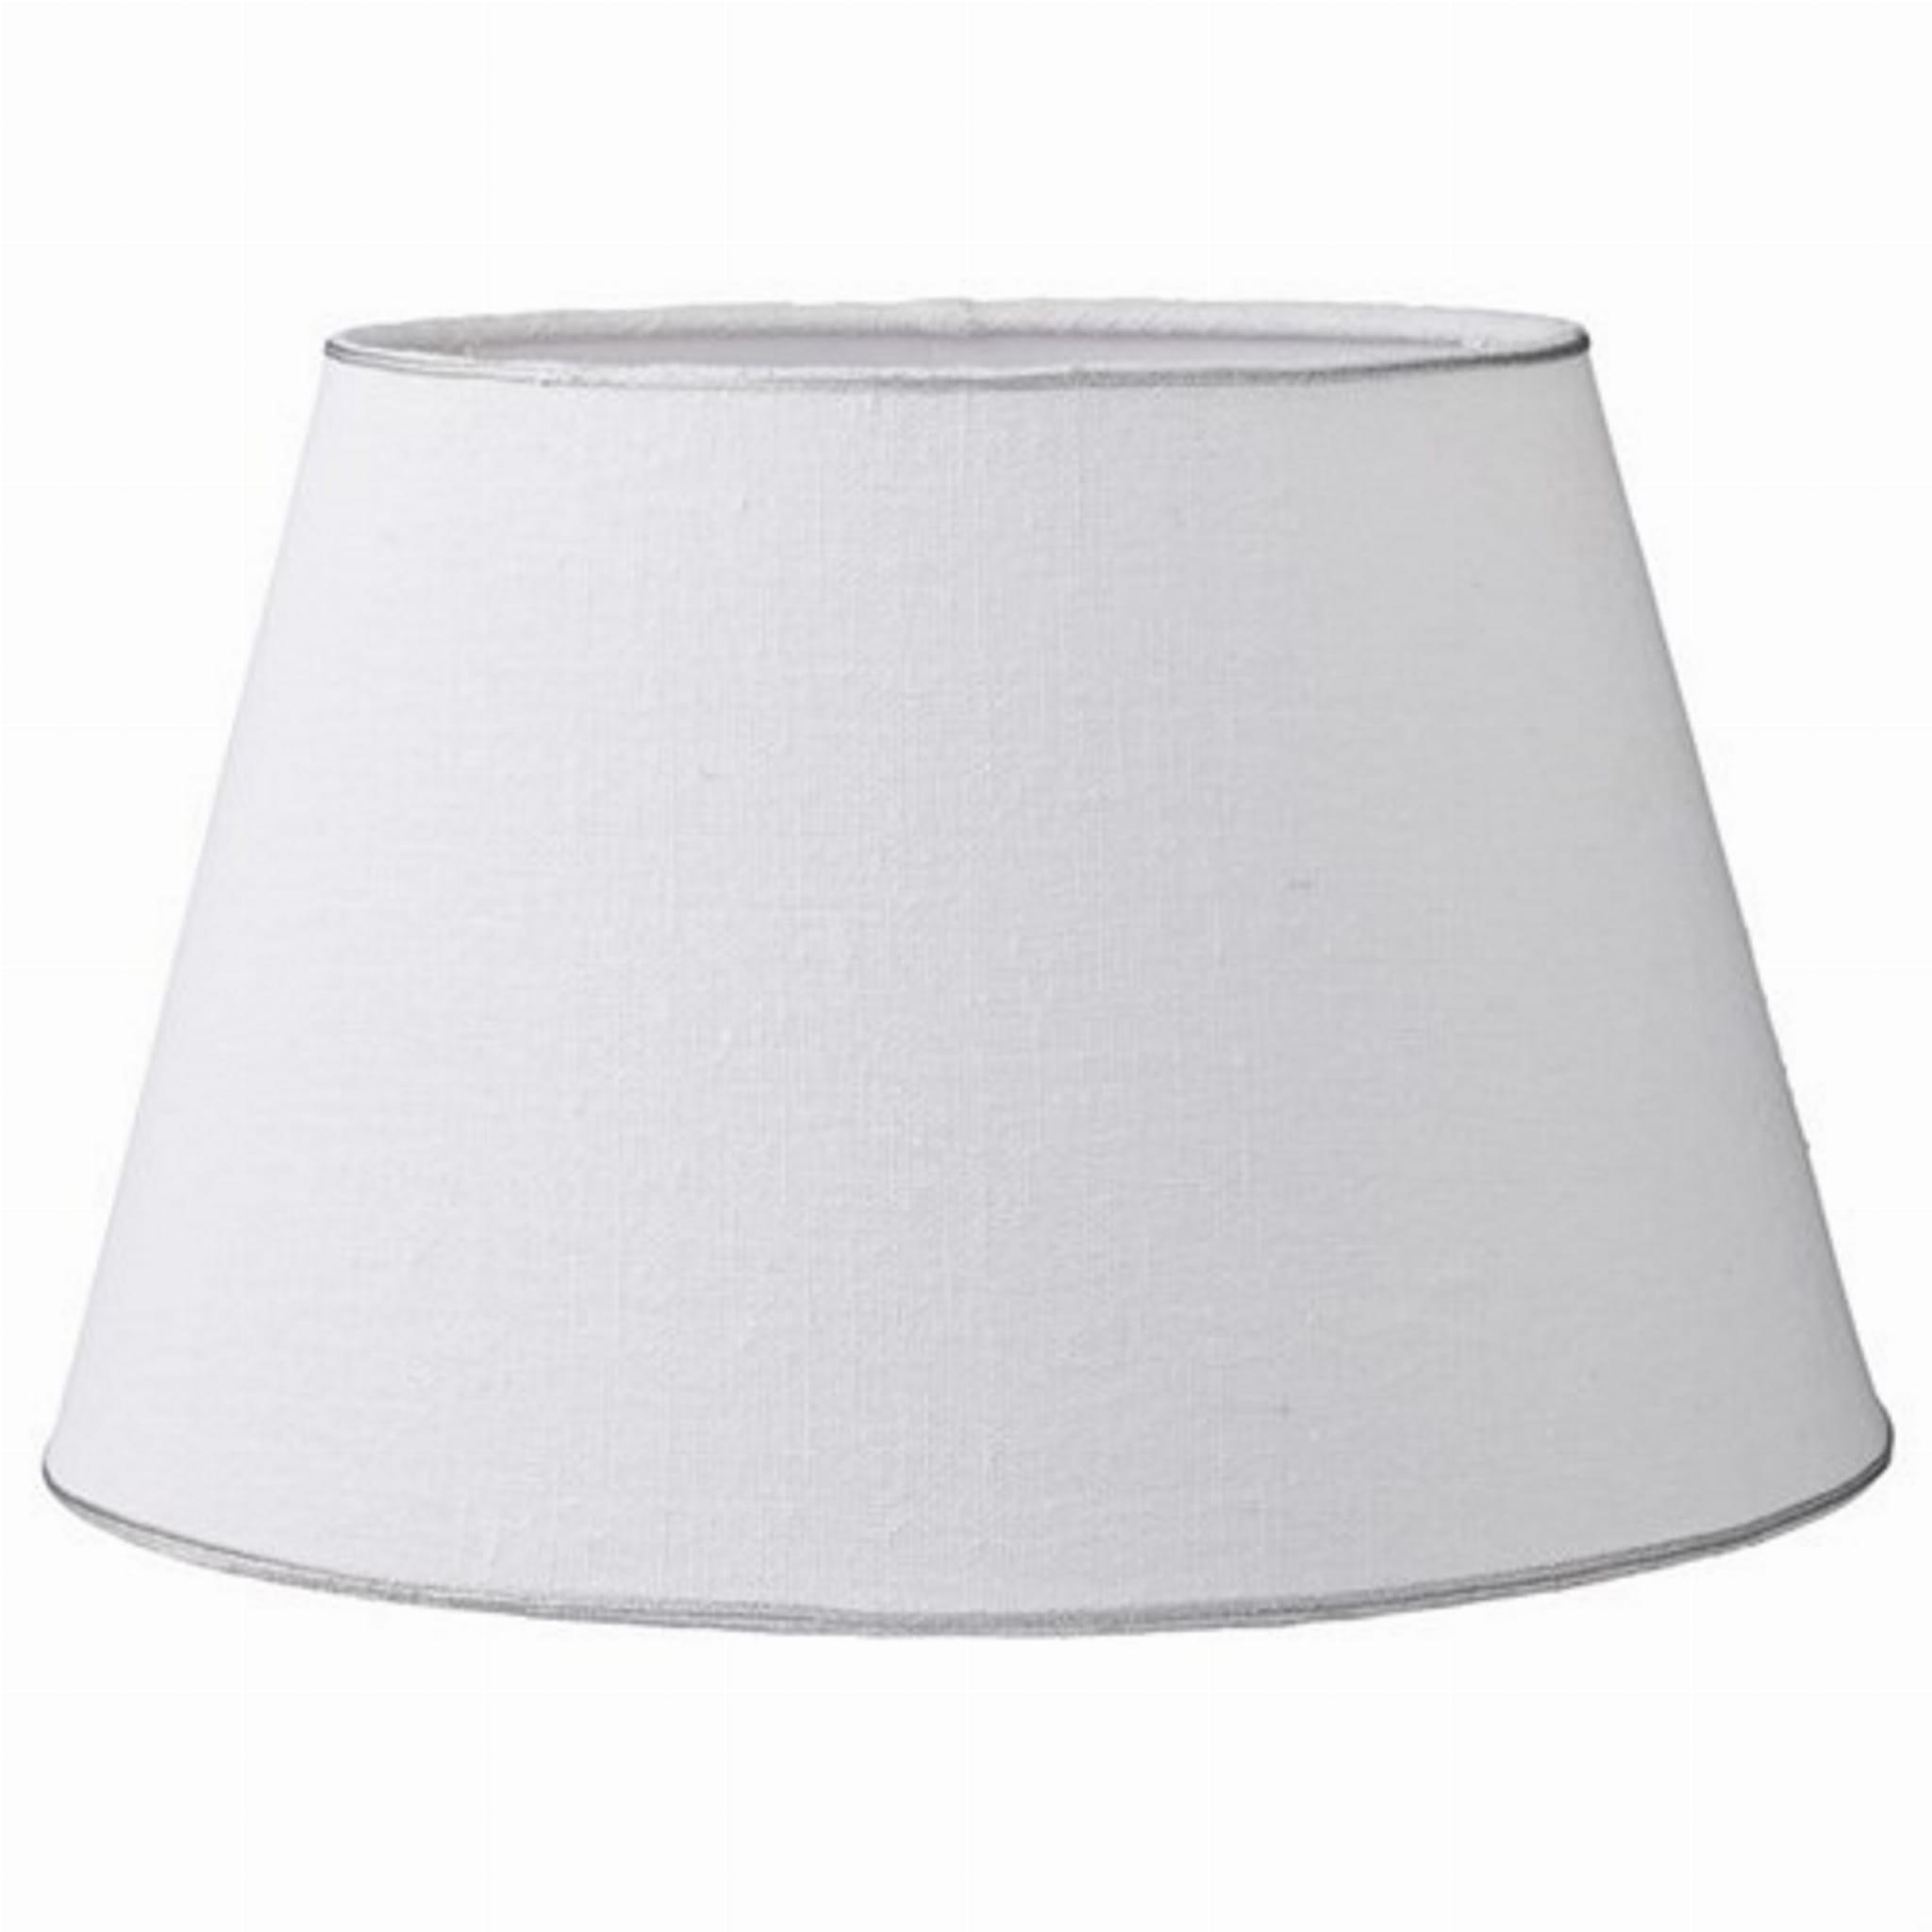 Klosz Abażur Do Lampy Rustic Linen ø25 Cm Lene Bjerre Lniany Biały